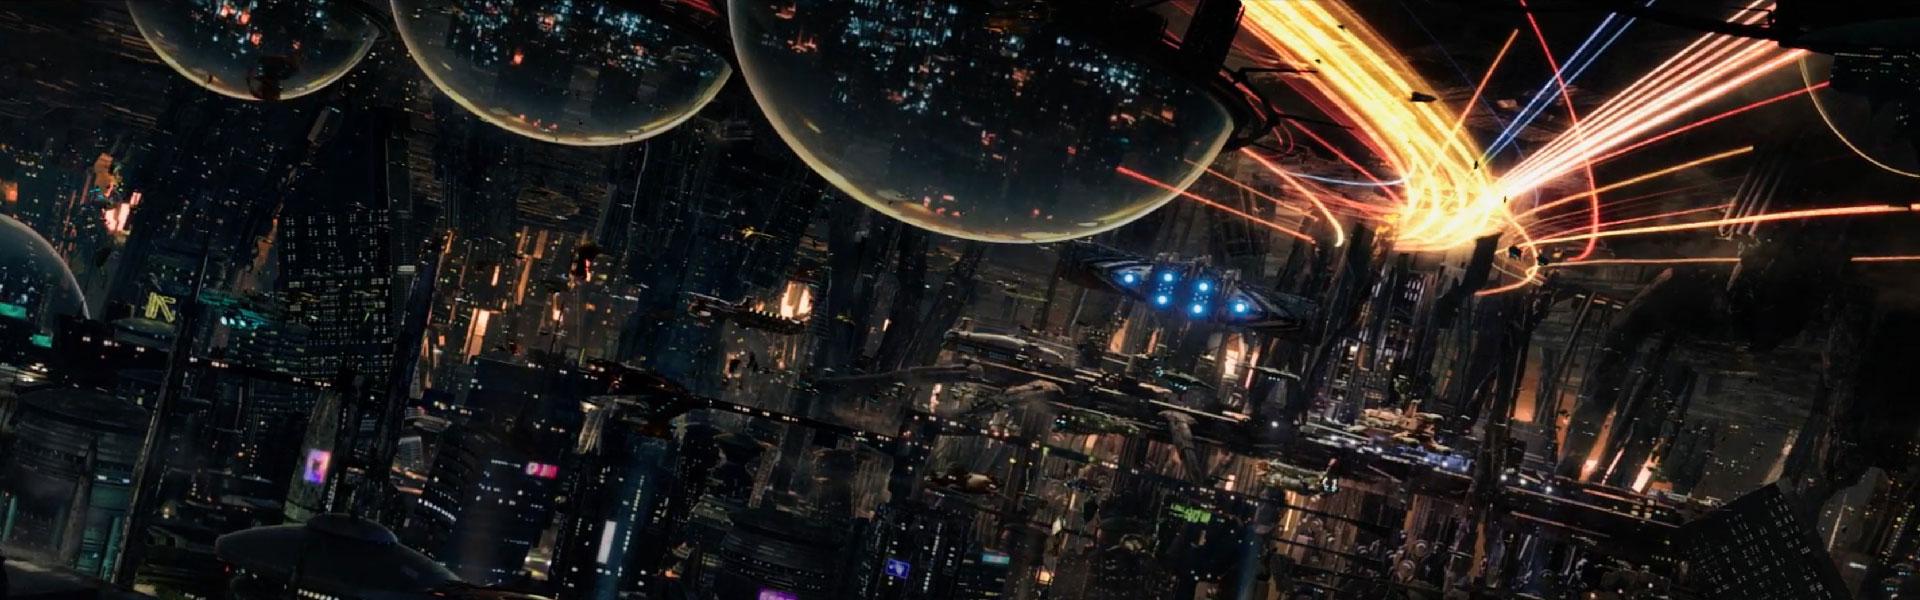 Valerian i Miasto Tysiąca Planet <span>(dubbing)</span>